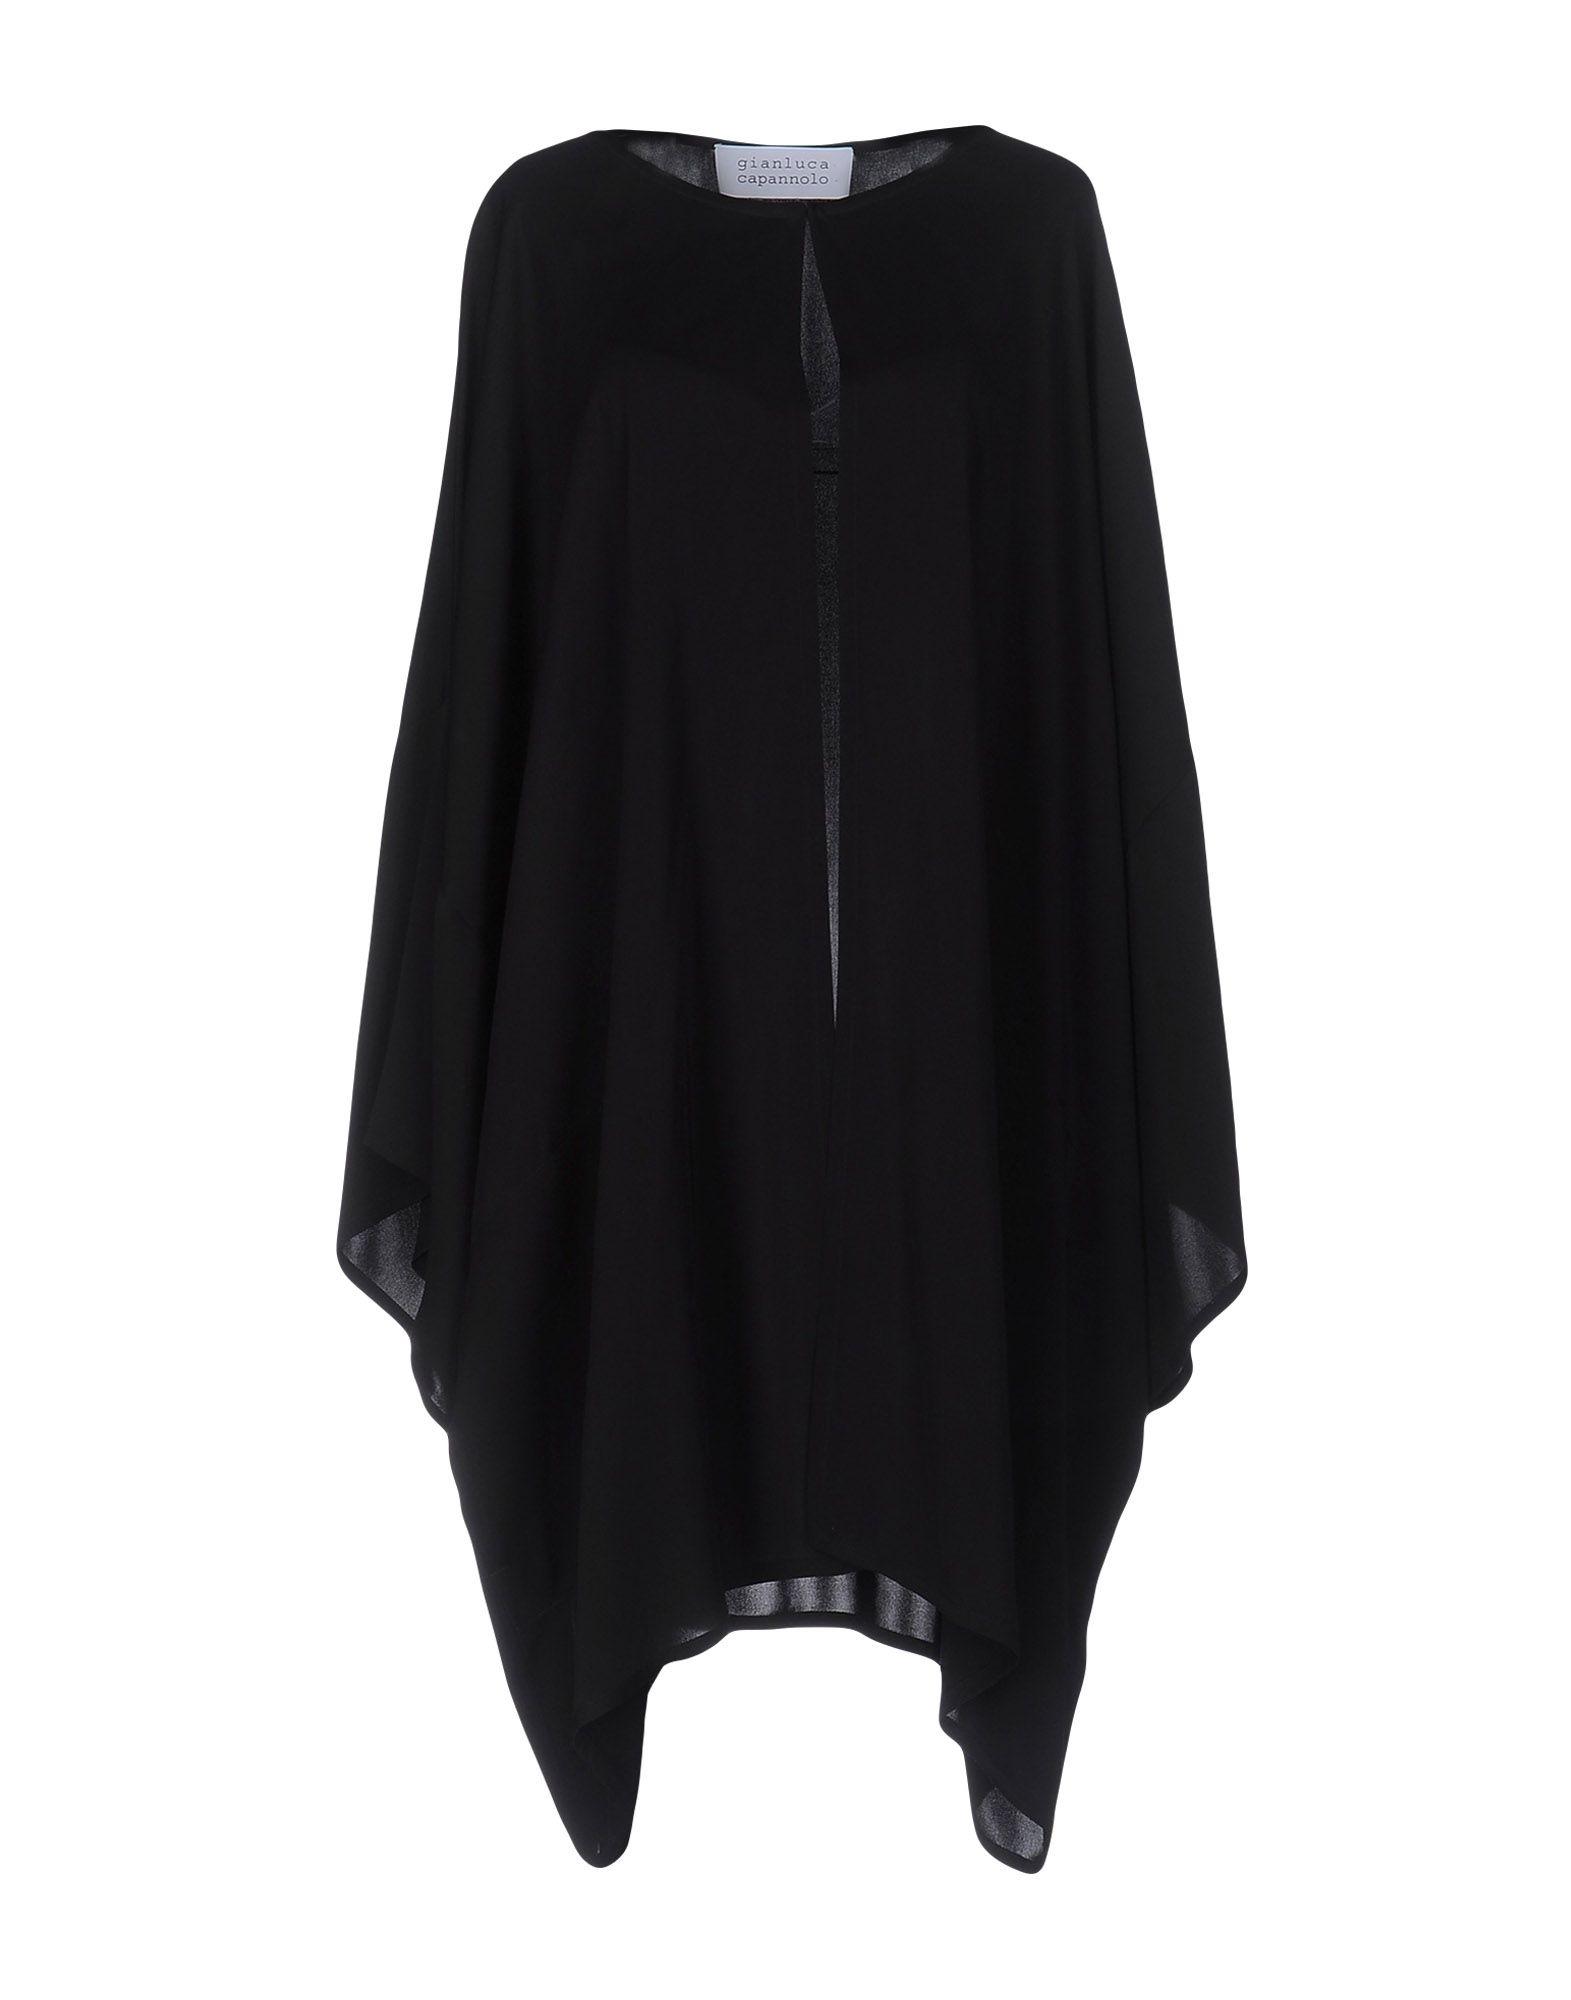 GIANLUCA CAPANNOLO Damen Lange Jacke Farbe Schwarz Größe 3 jetztbilligerkaufen